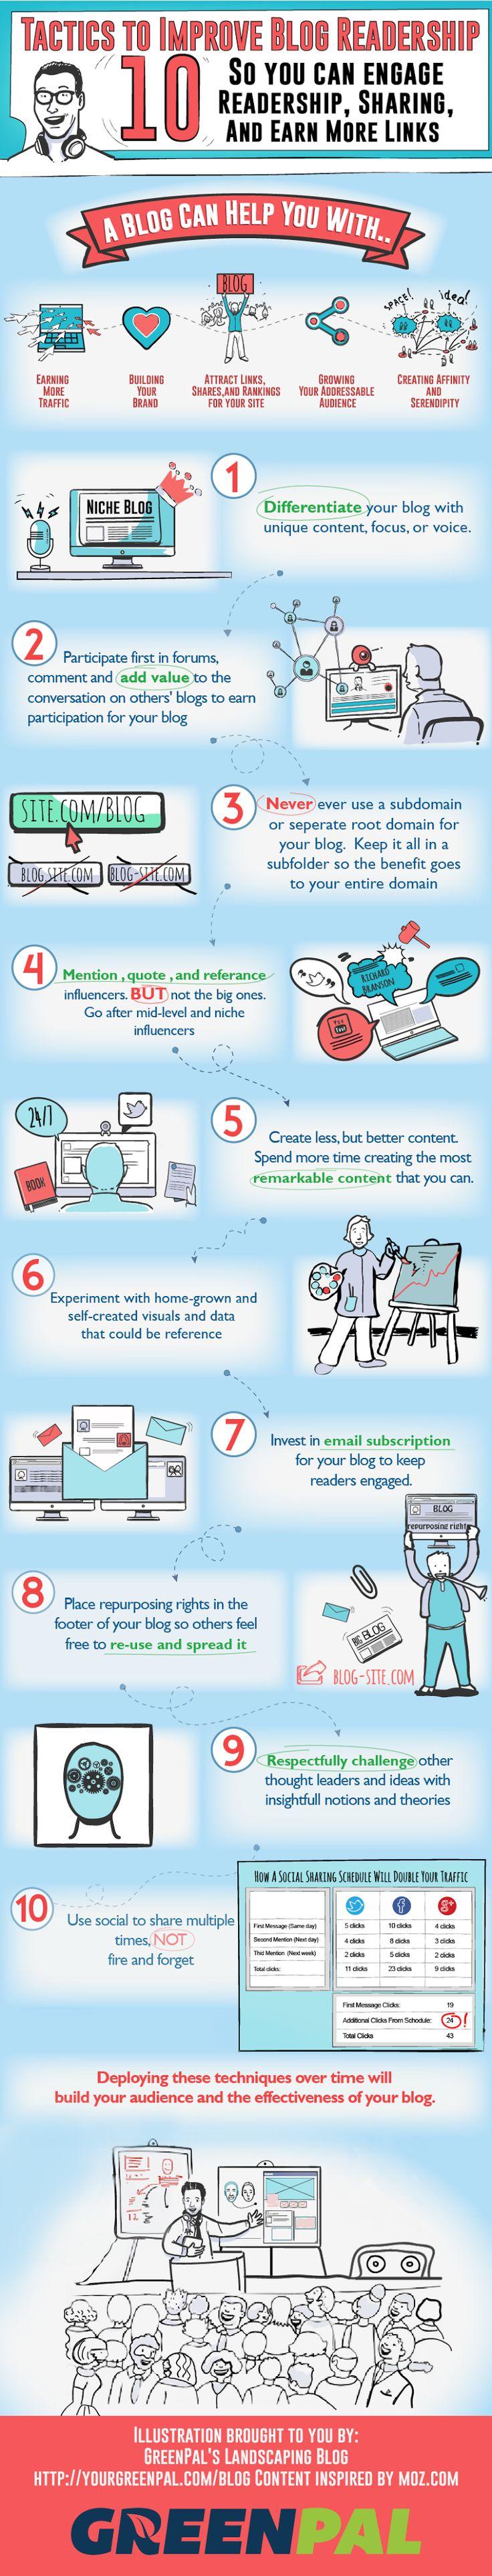 10 Tactics to Improve Blog Readership - #infographic #bloggingtips #contentmarketing